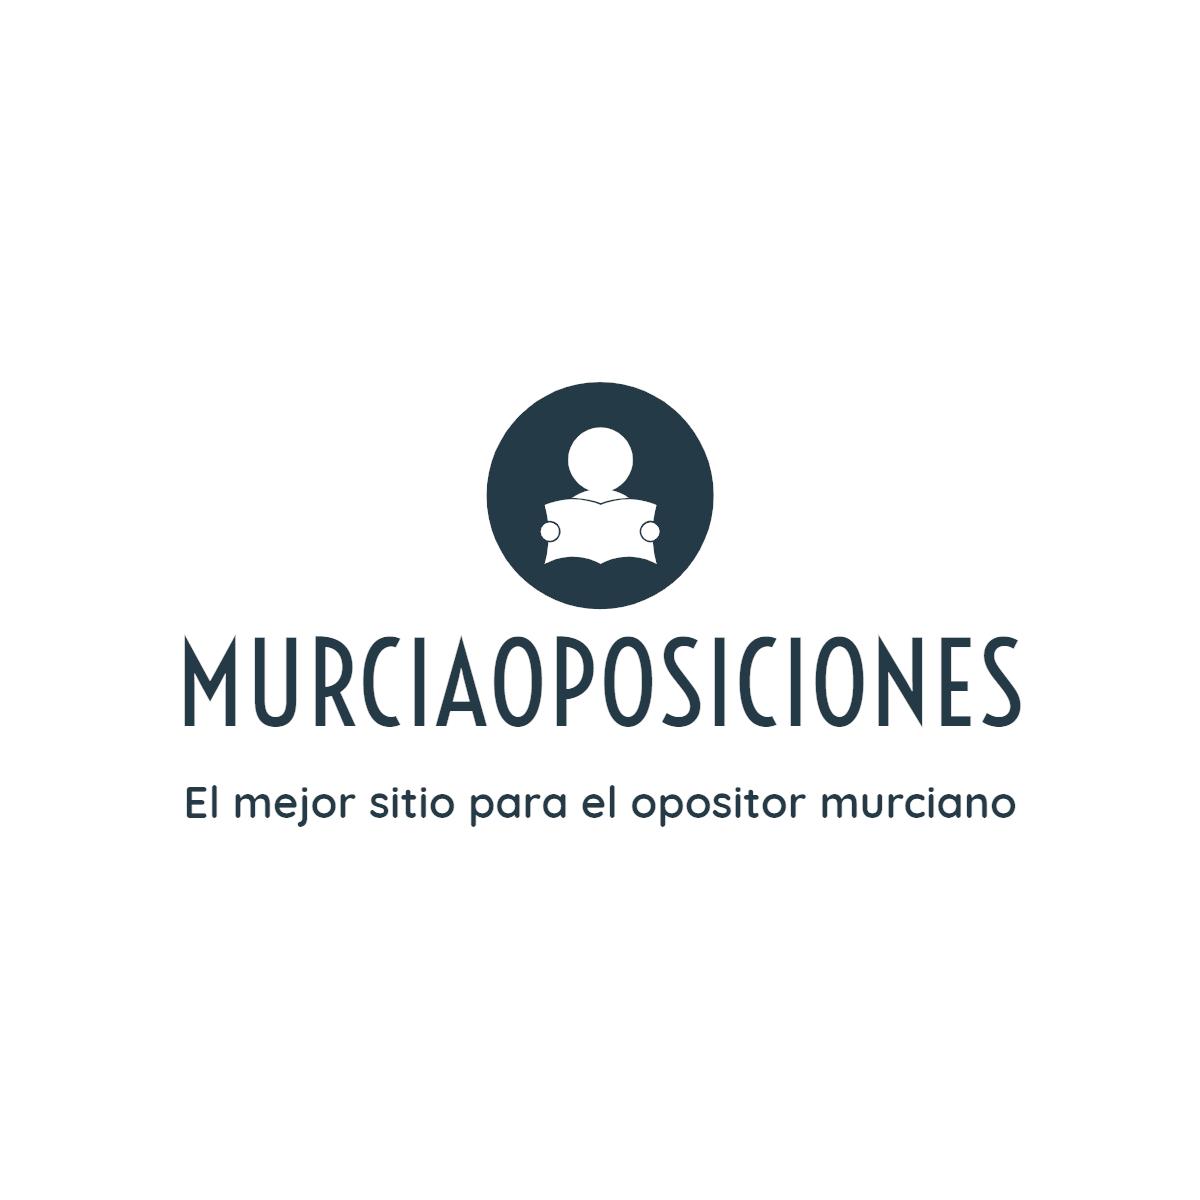 MURCIAOPOSICIONES.COM